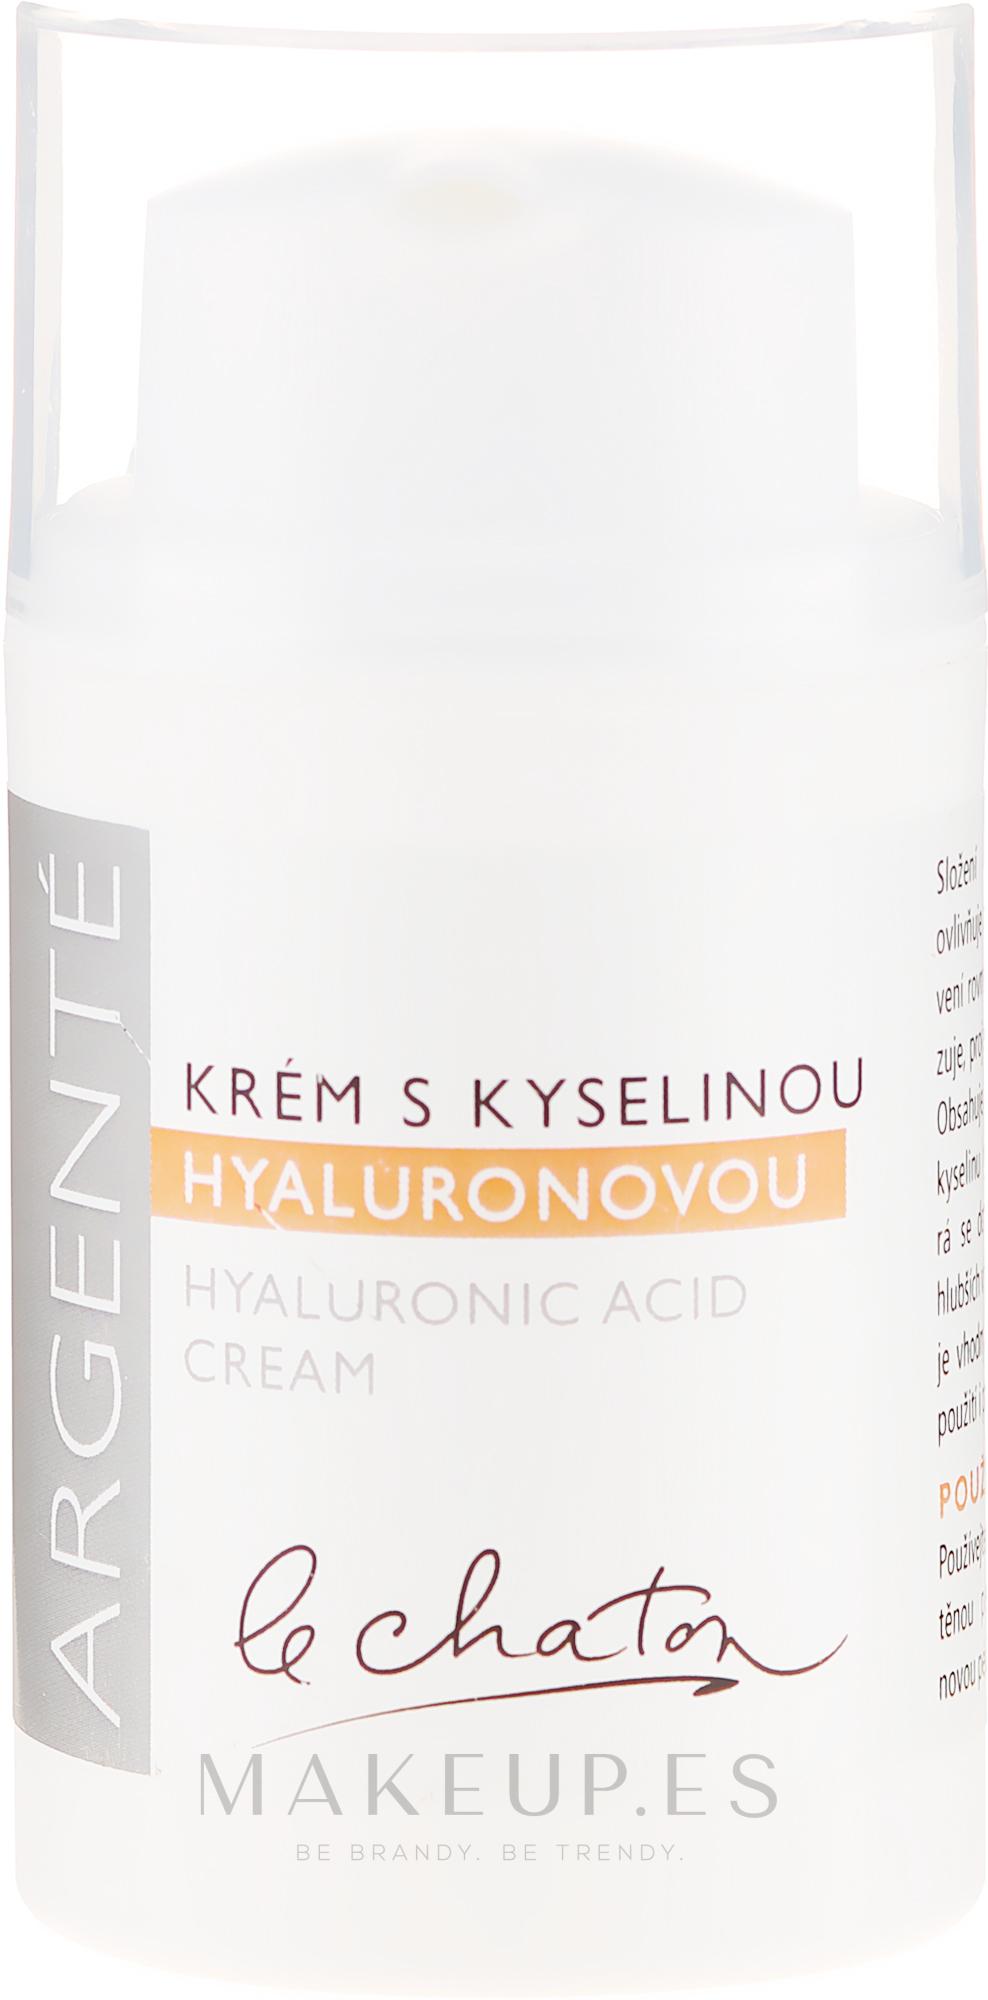 Crema facial hidratante con ácido hialurónico - Le Chaton Argente Moisturizer With Hyaluronic Acid — imagen 50 g